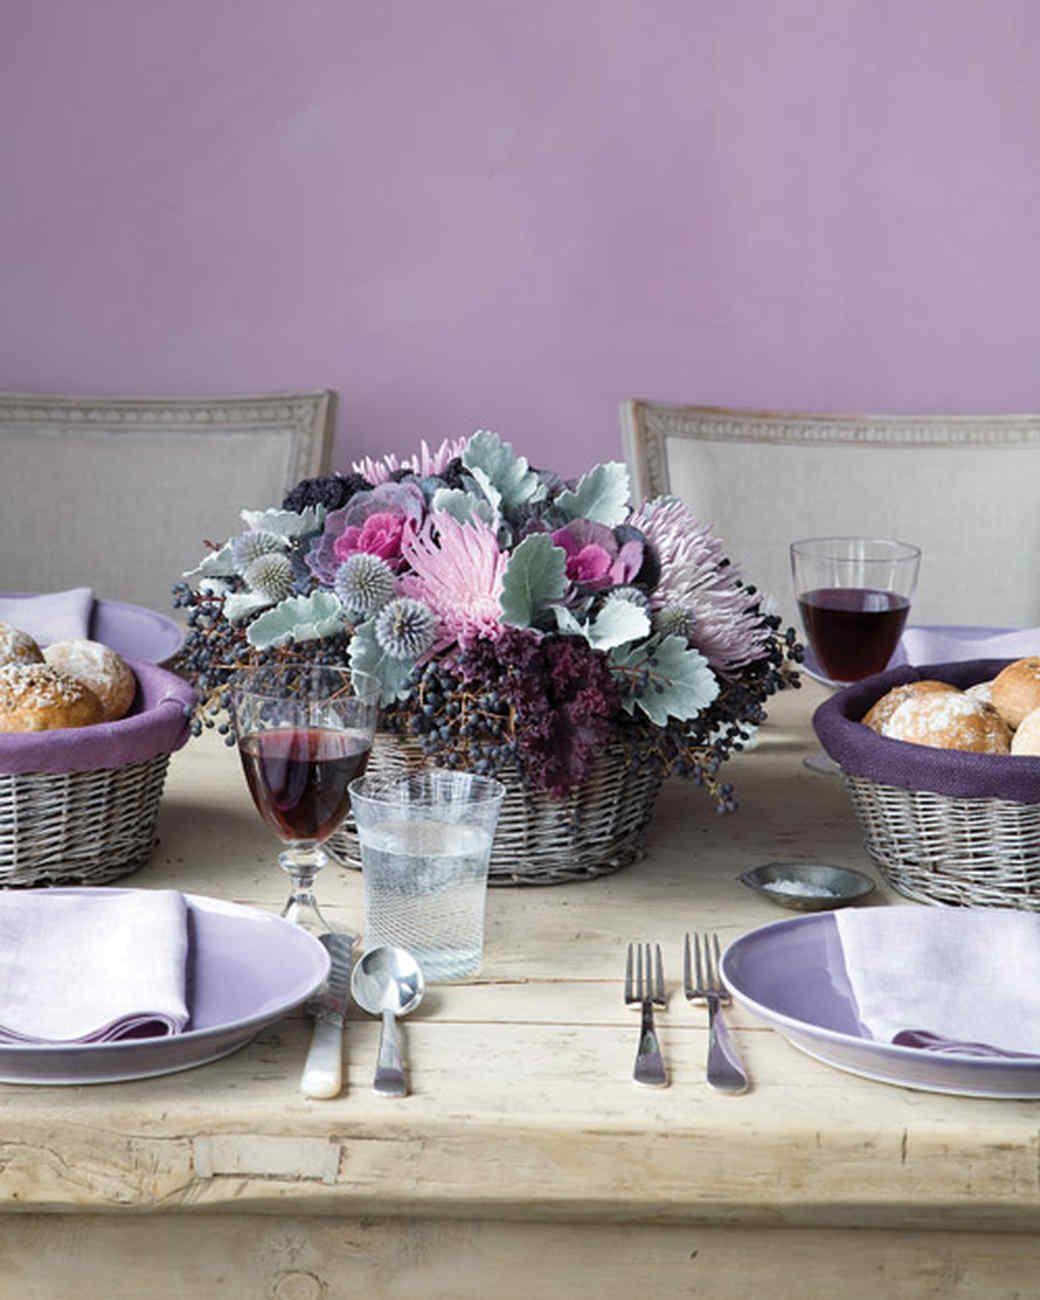 Silver Coated Lined Basket Centerpiece Martha Stewart ThanksgivingThanksgiving TableDining